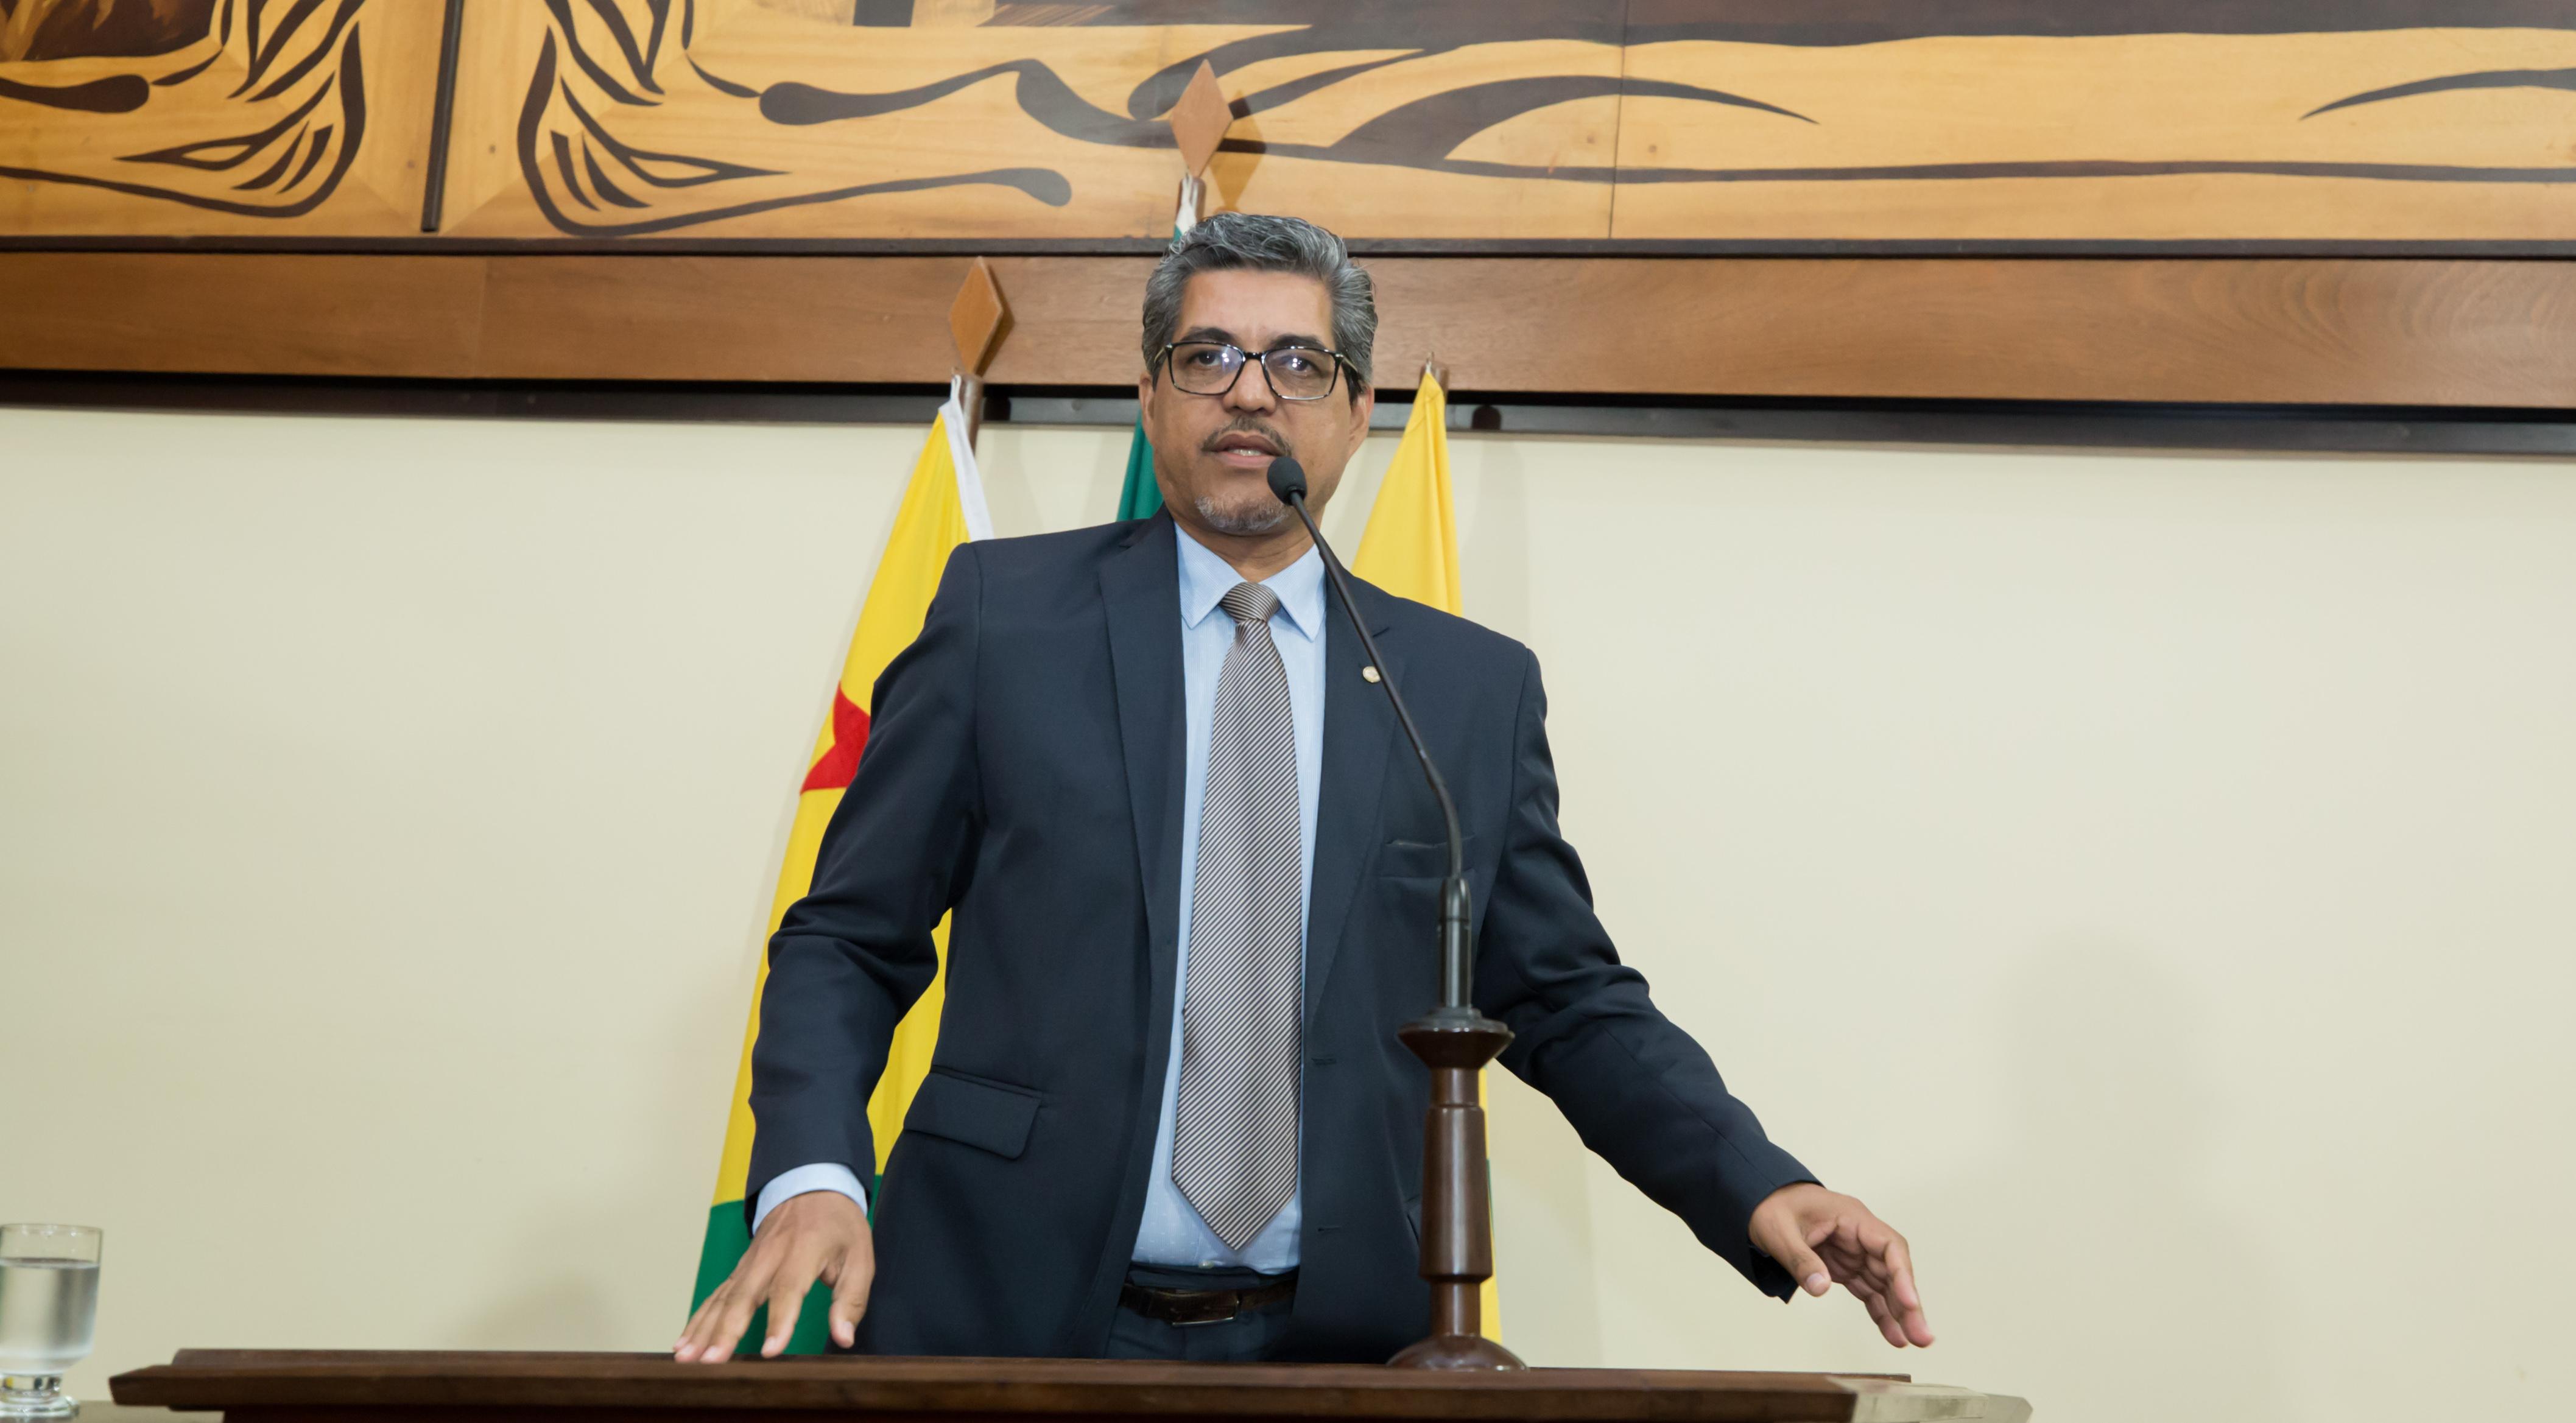 Deputado Edvaldo Magalhães lamenta morte de amigos vítimas da Covid-19